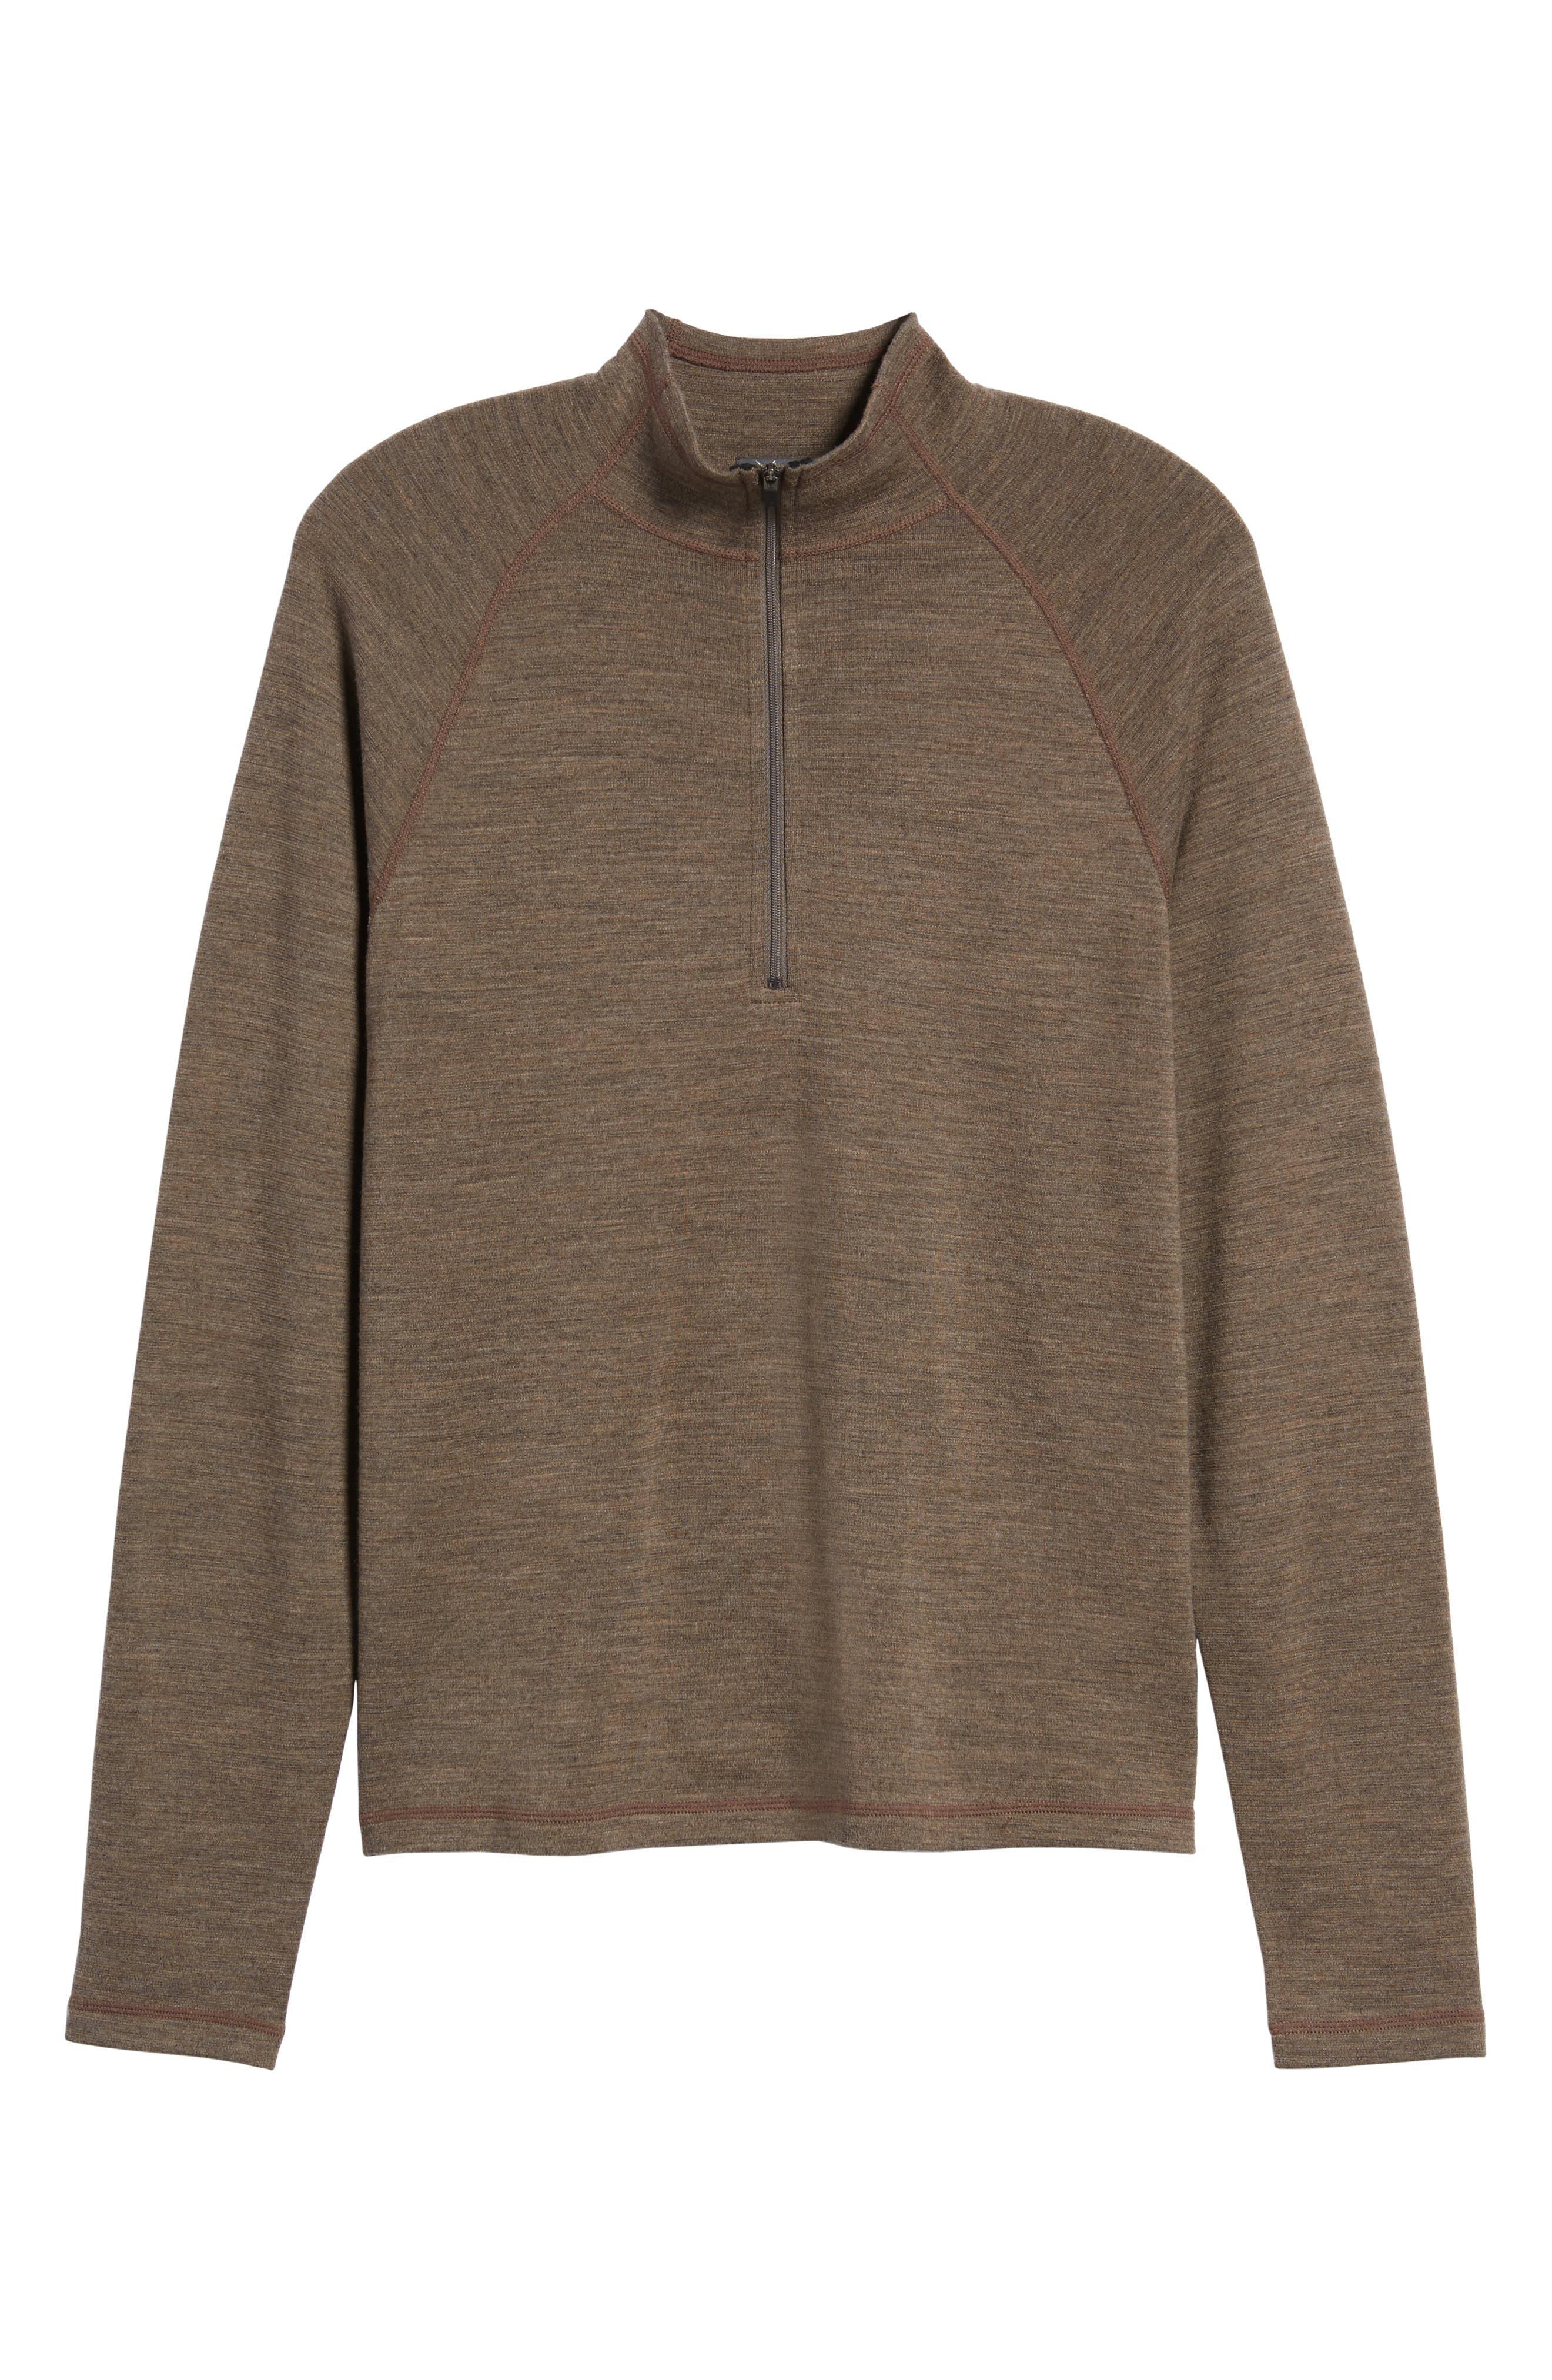 'Shak' Merino Wool Quarter Zip Top,                             Alternate thumbnail 4, color,                             Dark Rye Heather